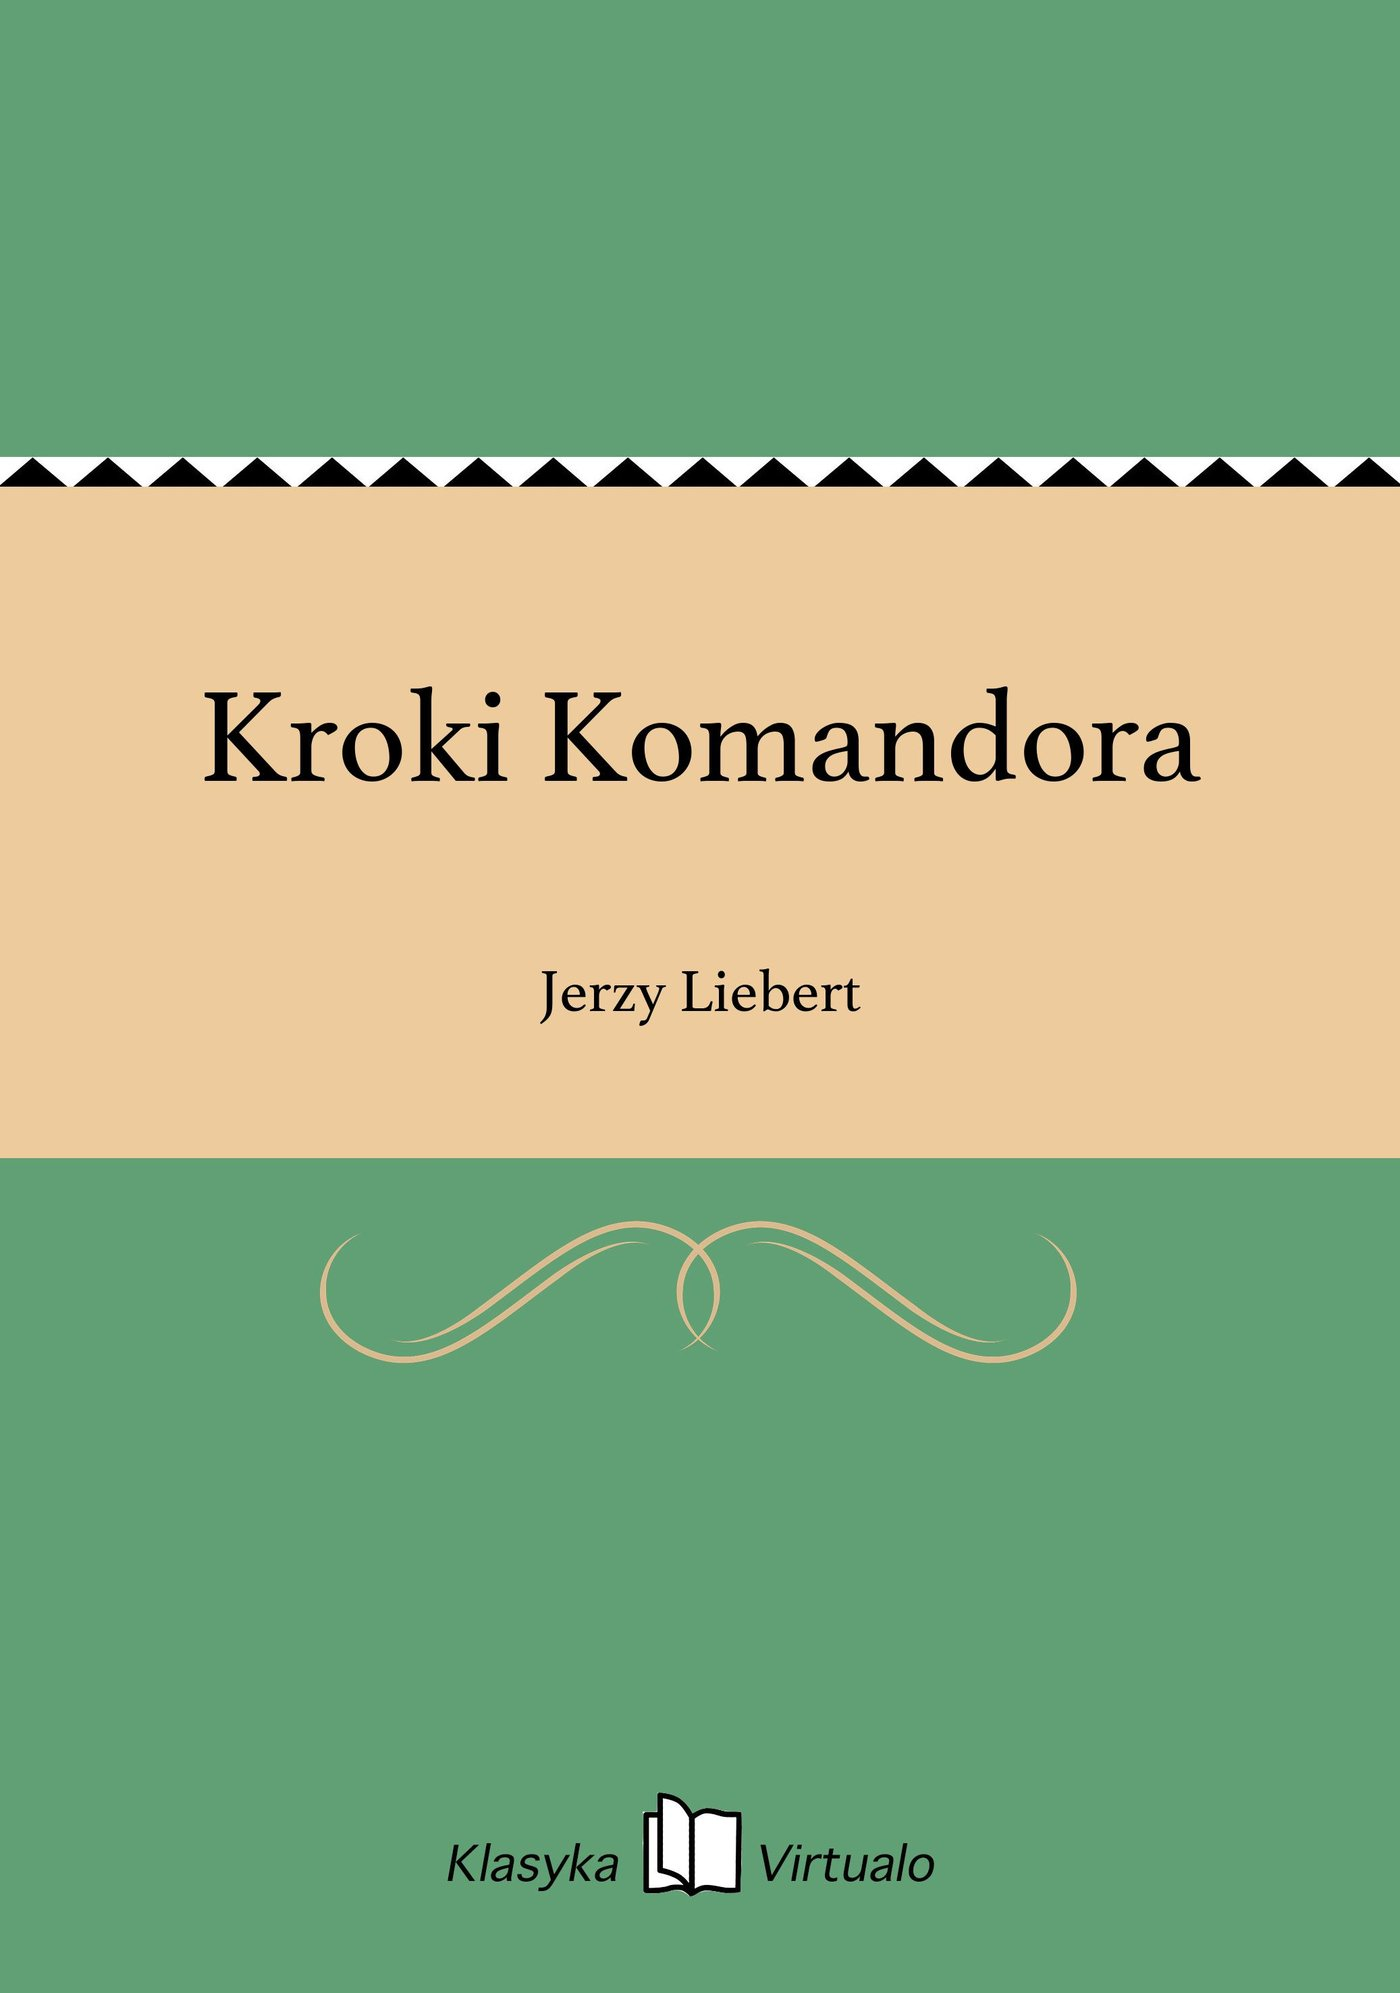 Kroki Komandora - Ebook (Książka na Kindle) do pobrania w formacie MOBI